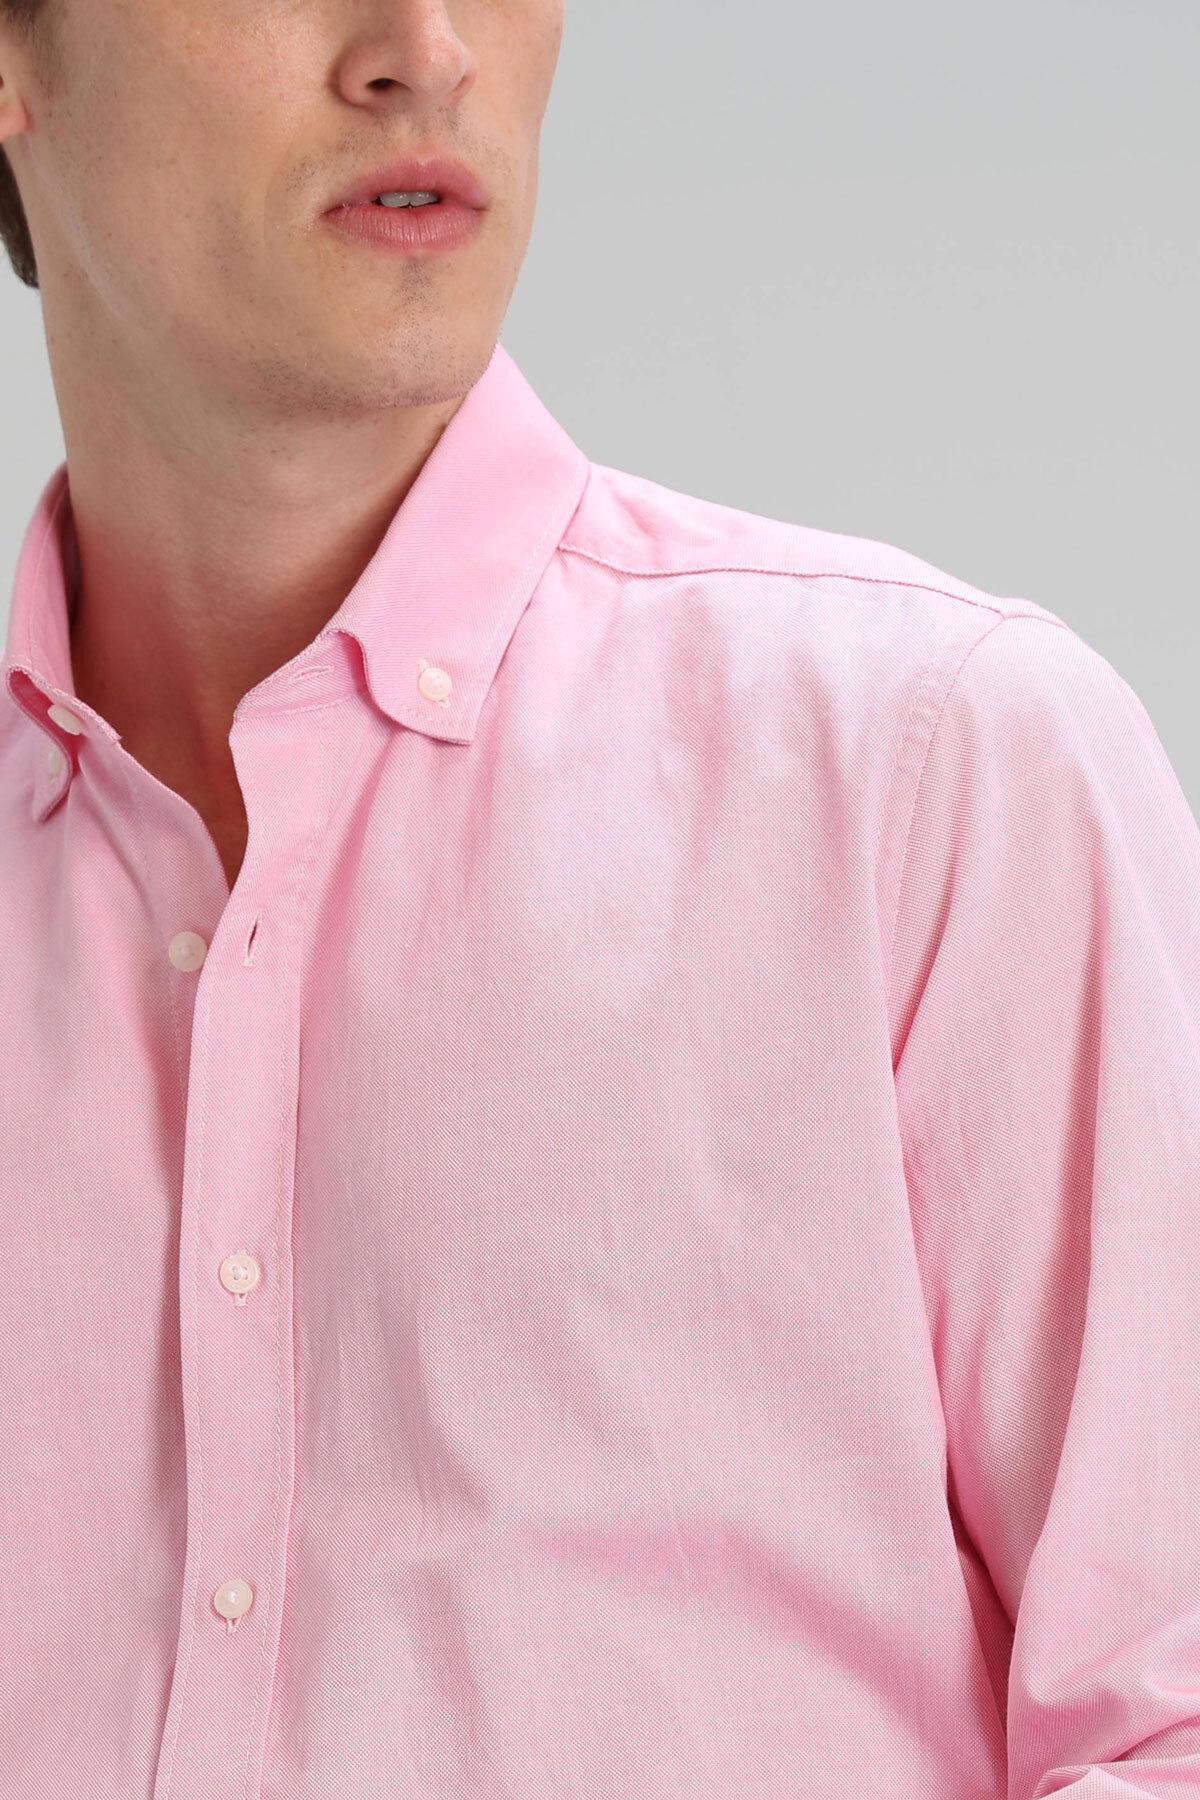 Danıel Erkek Basic Gömlek Comfort Slim Fit Pembe